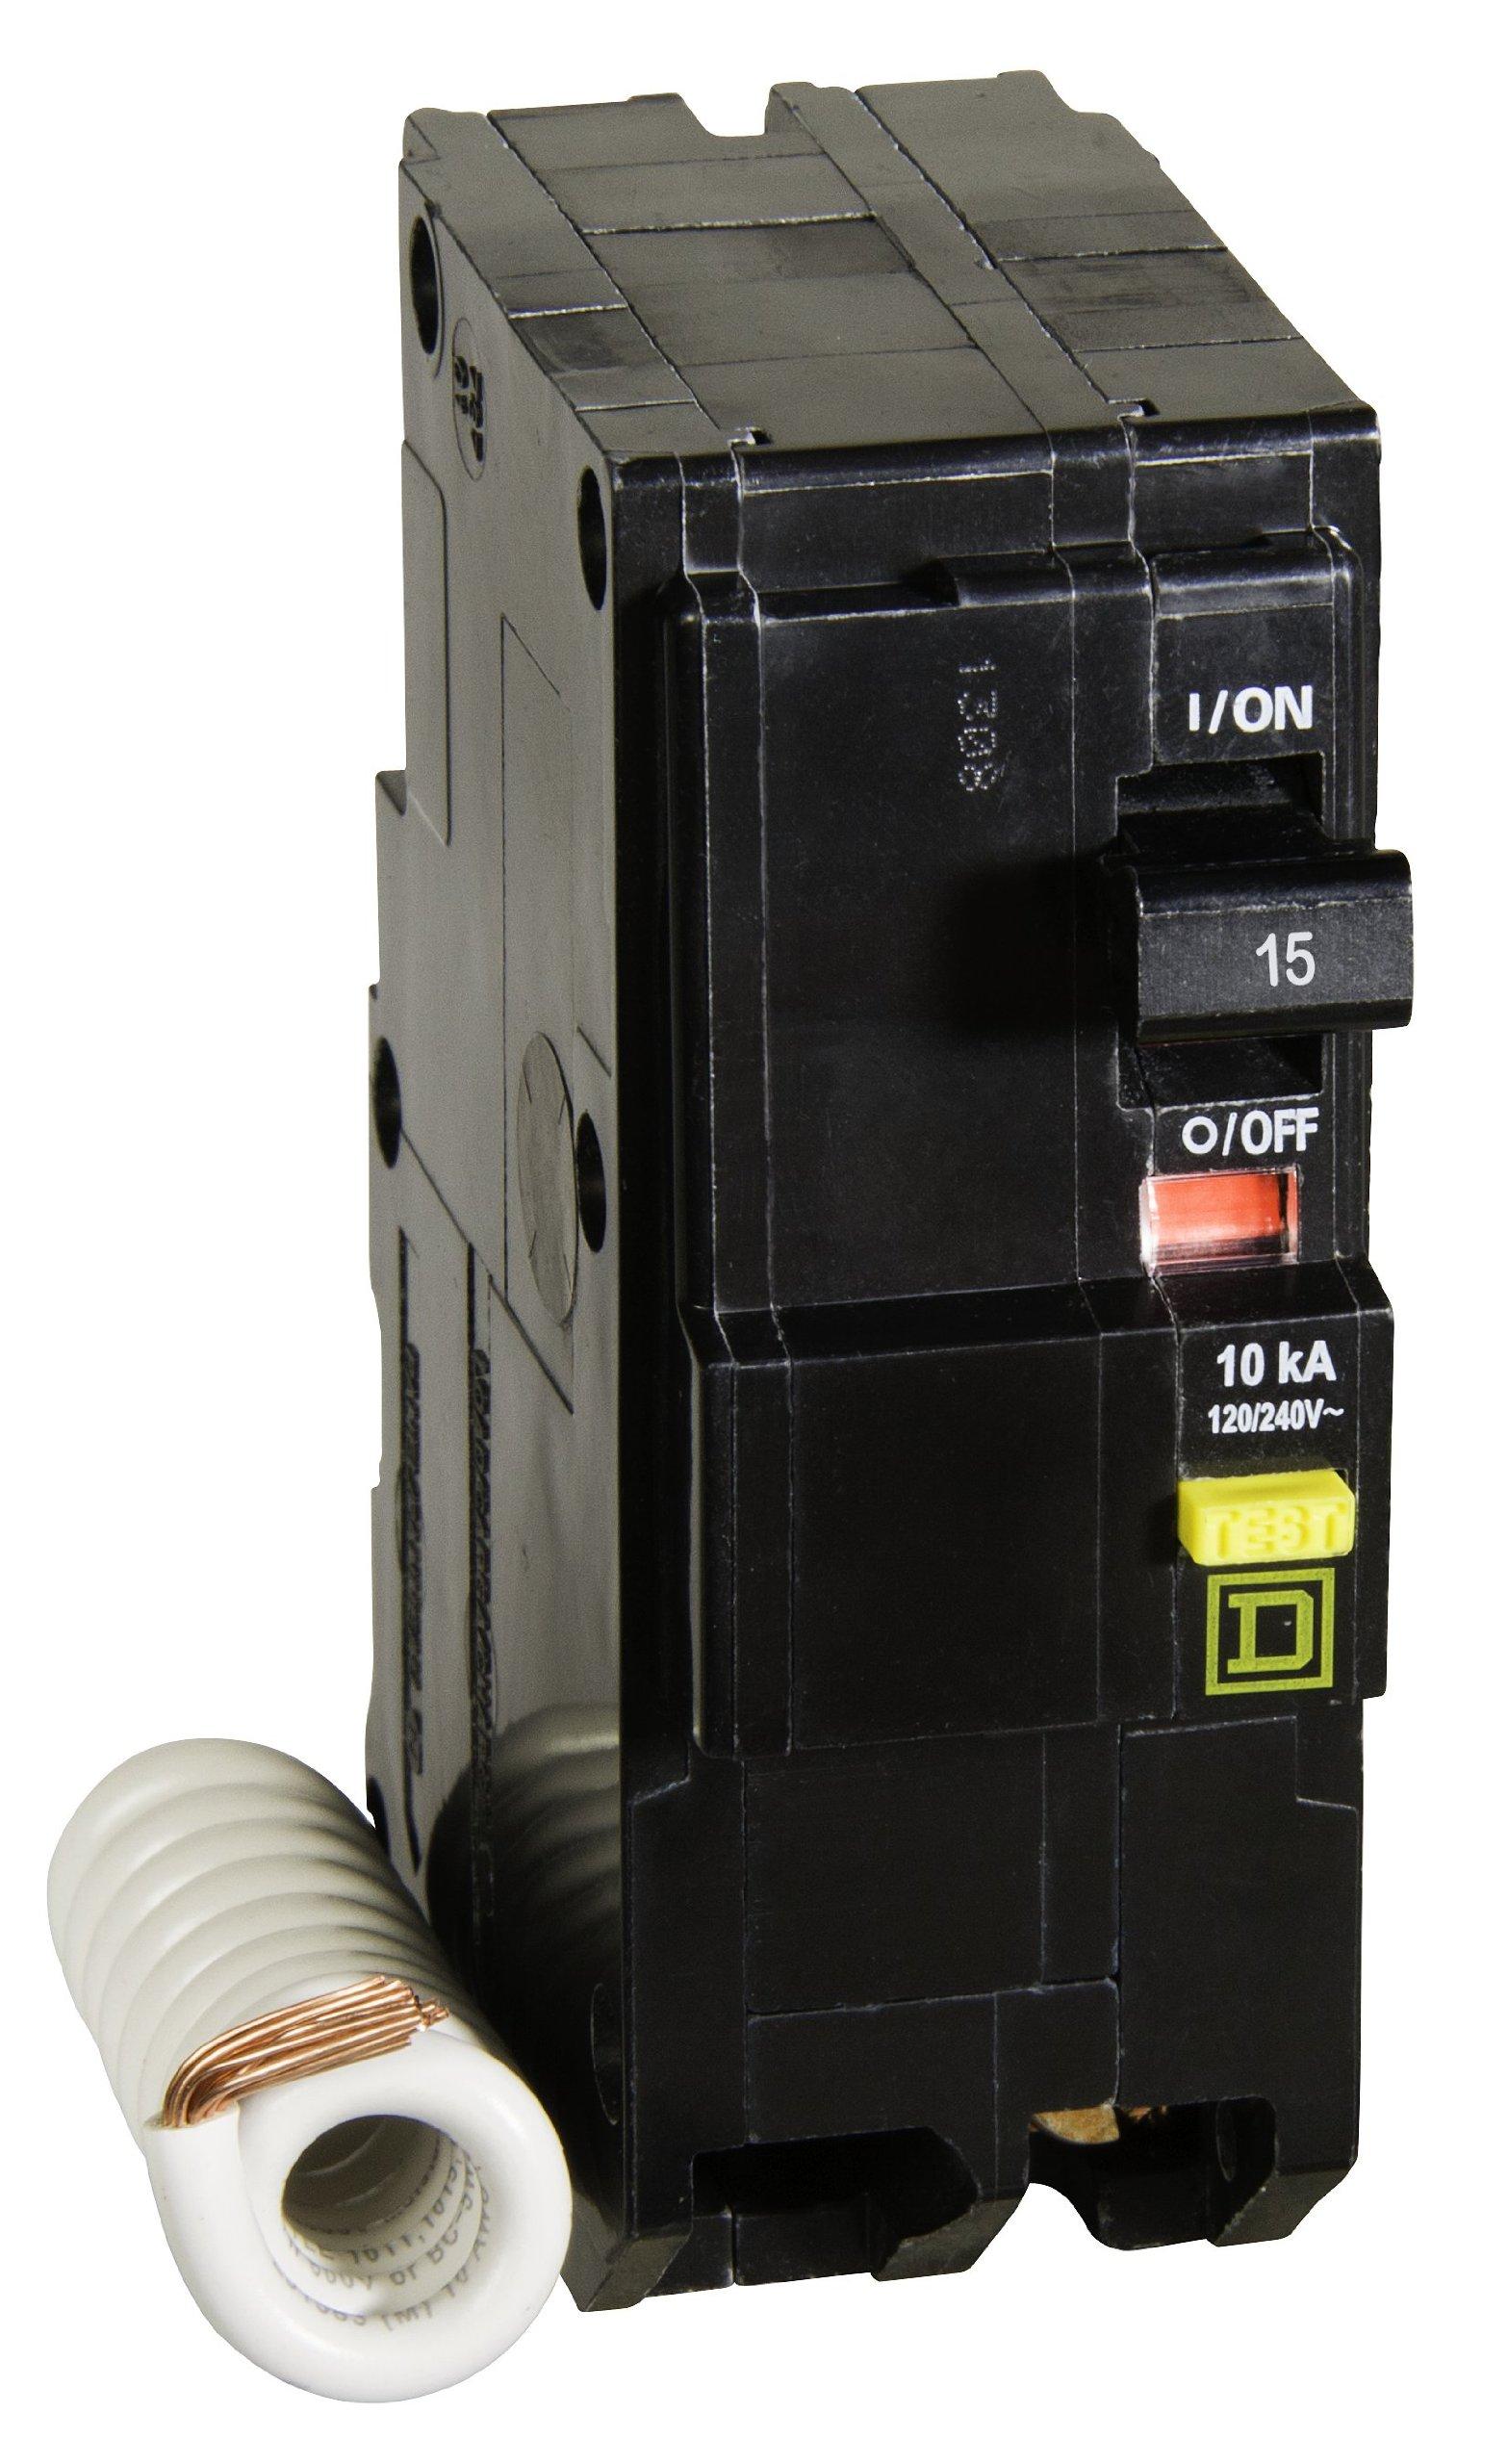 Square D by Schneider Electric QO215GFICP QO Qwik-Gard 15-Amp Two-Pole GFCI Breaker